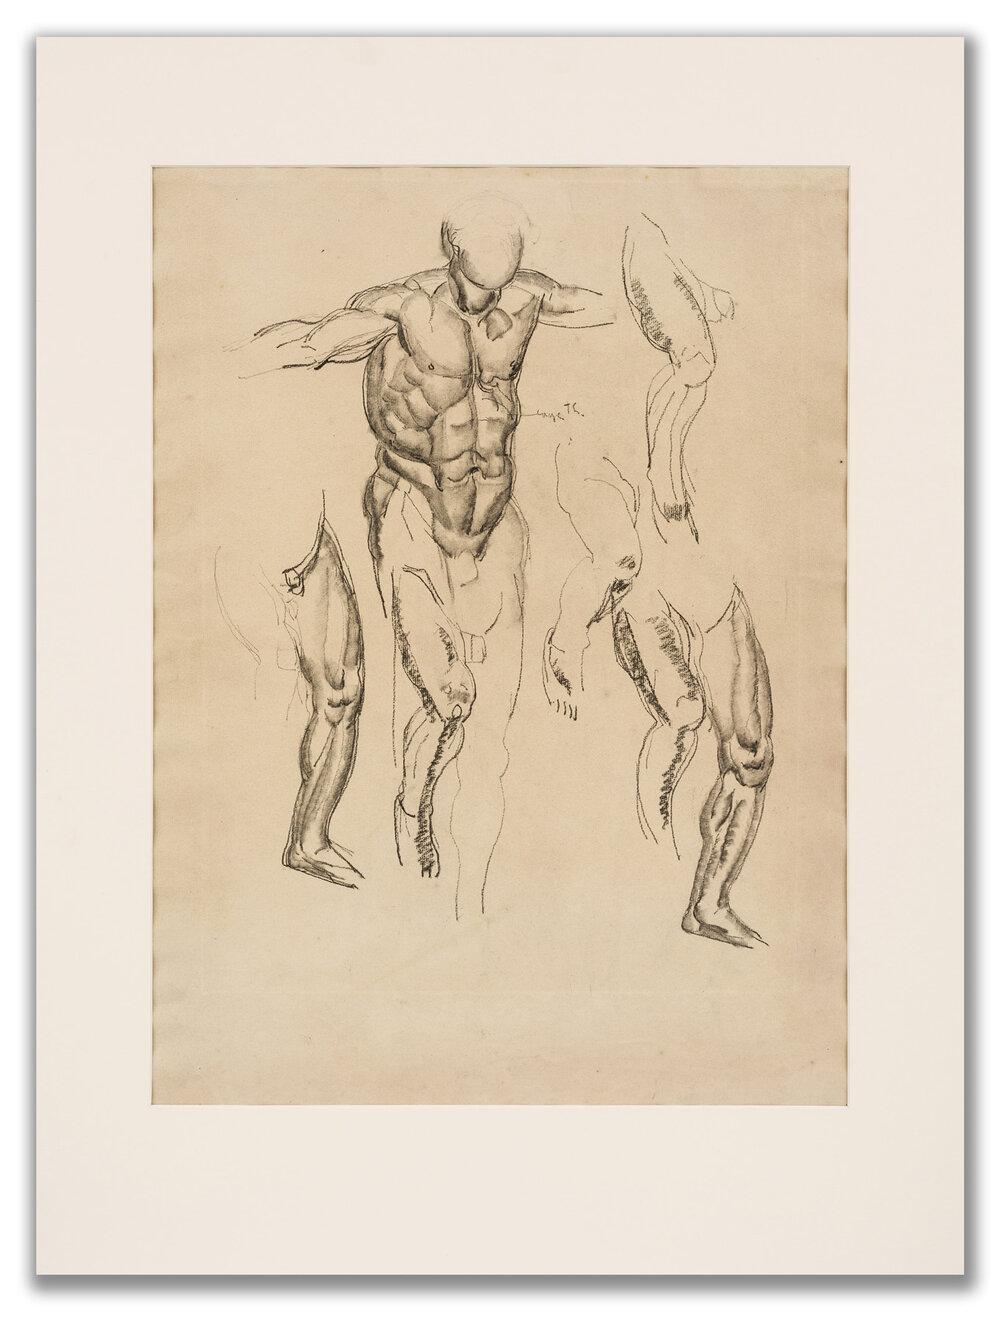 Marcel-Lenoir, (French 1872-1931), Academic Study, c.1920.